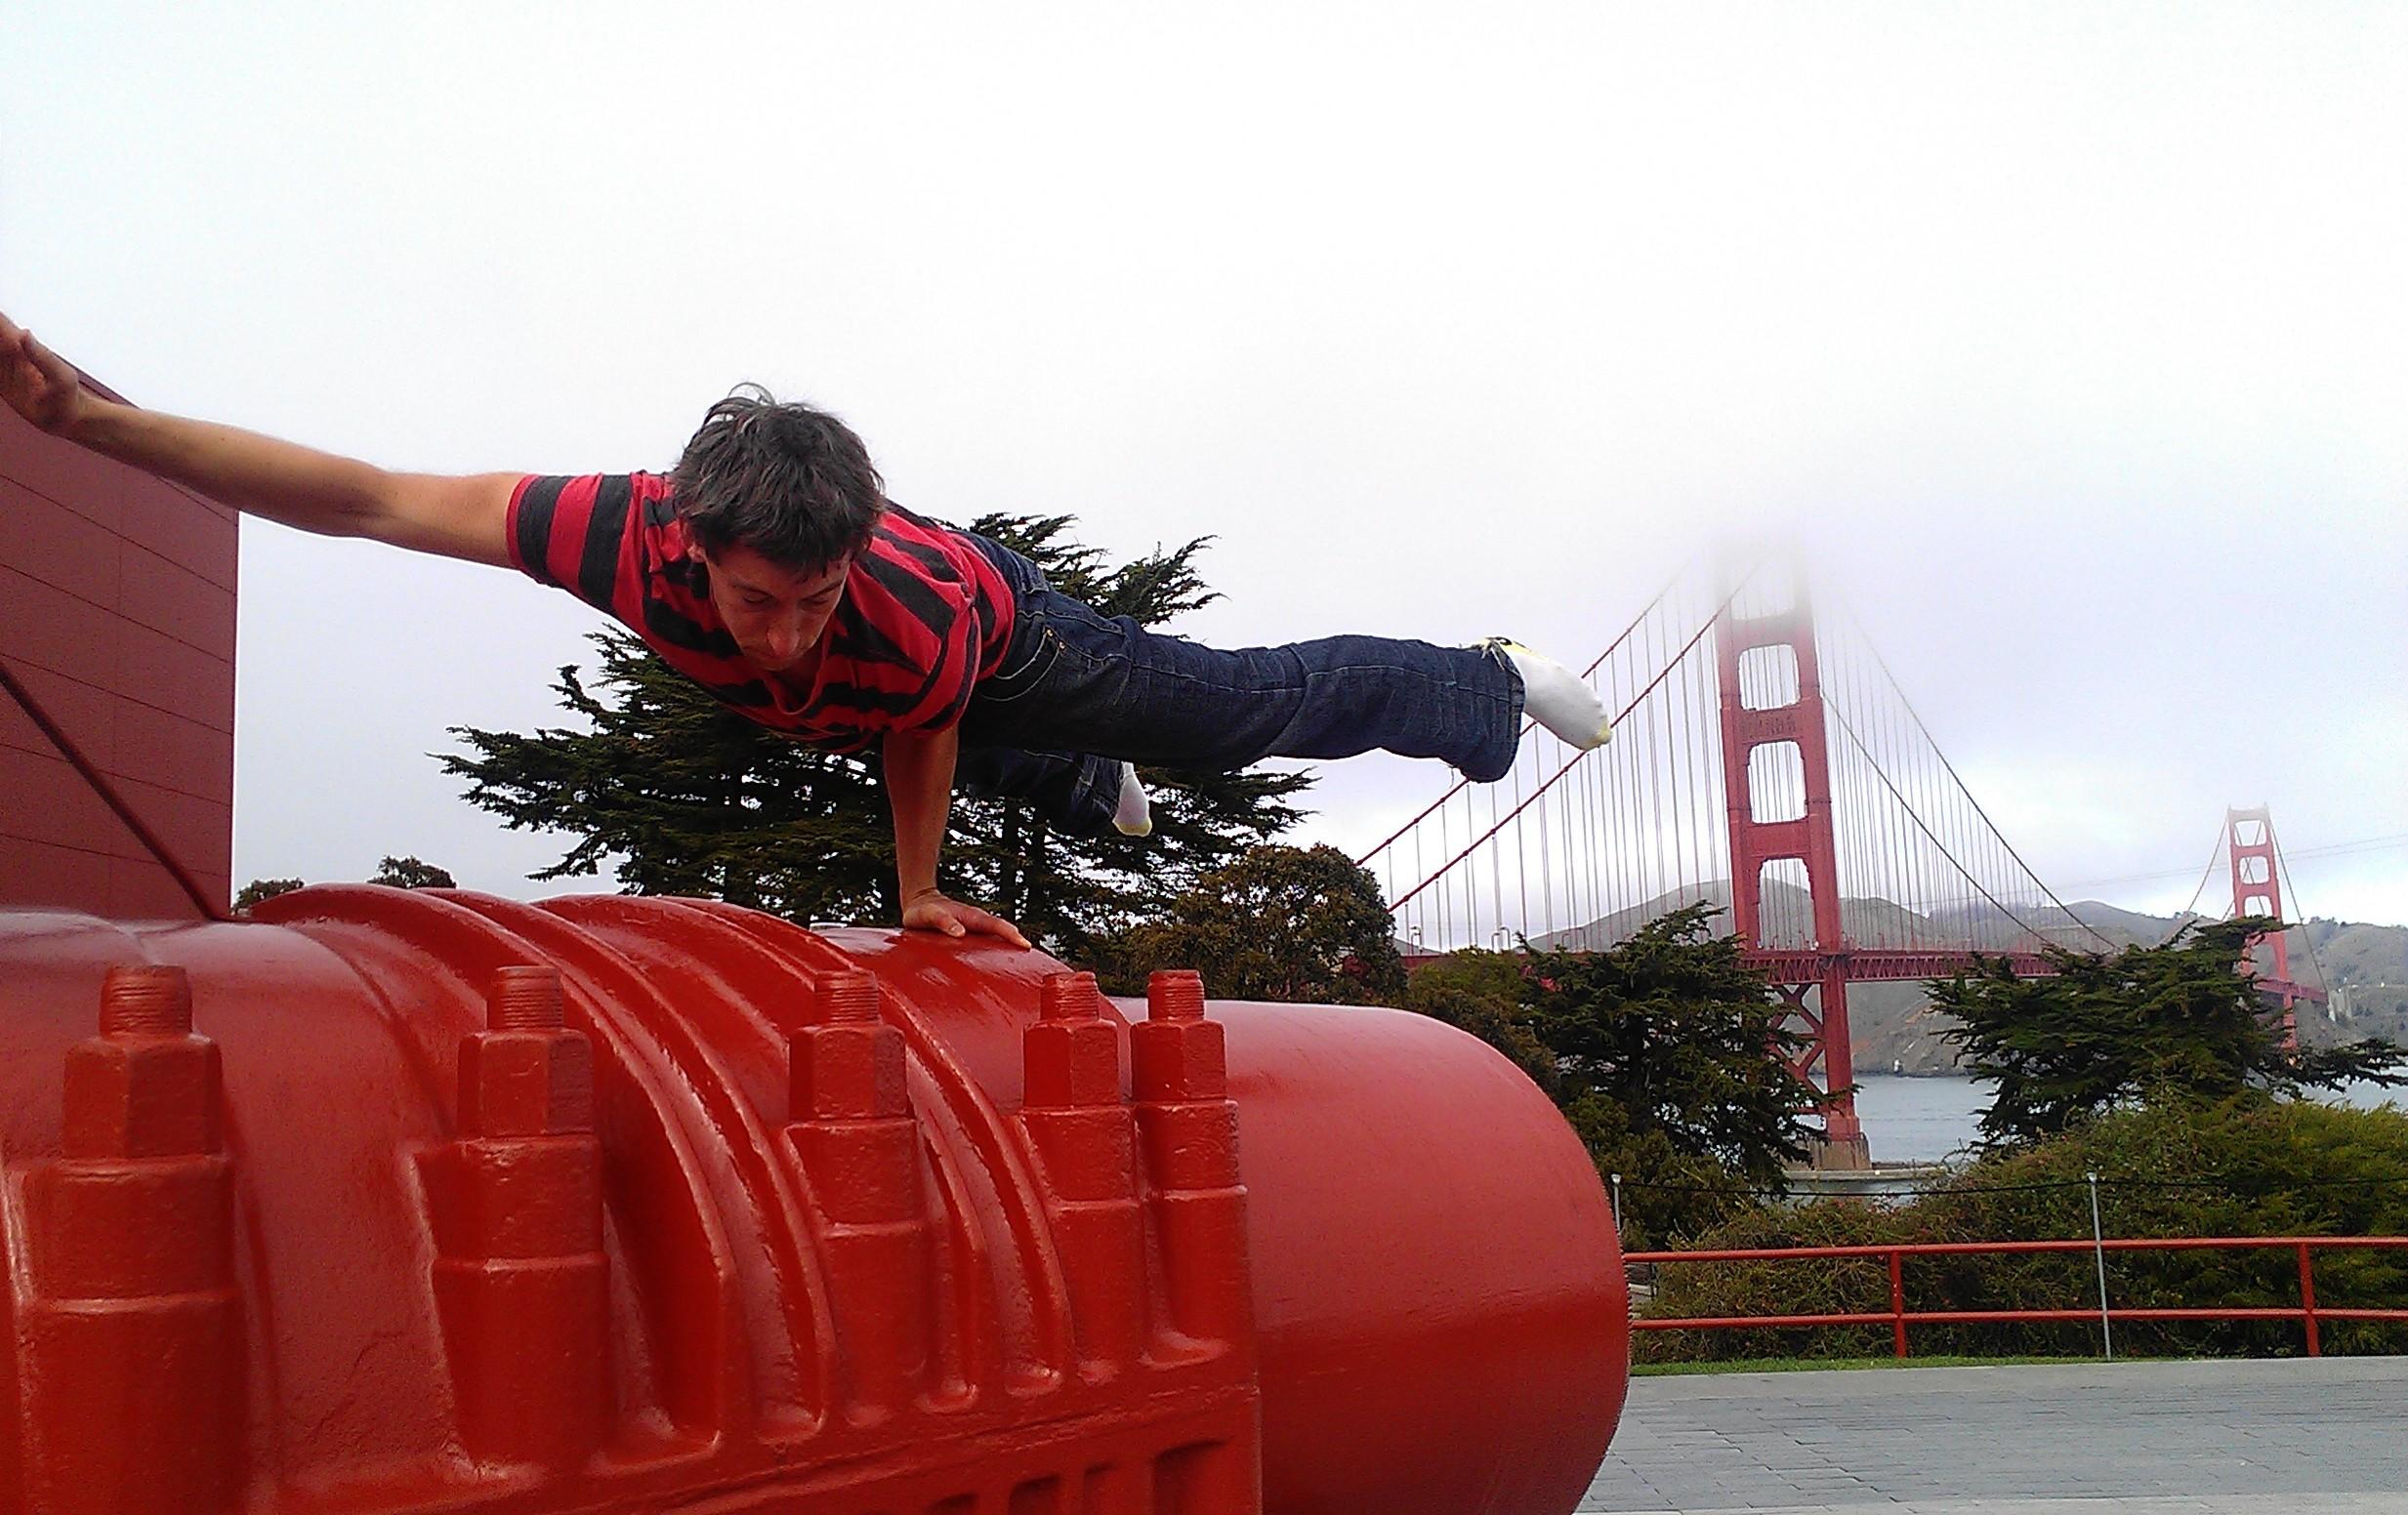 Load testing the Golden Gate Bridge